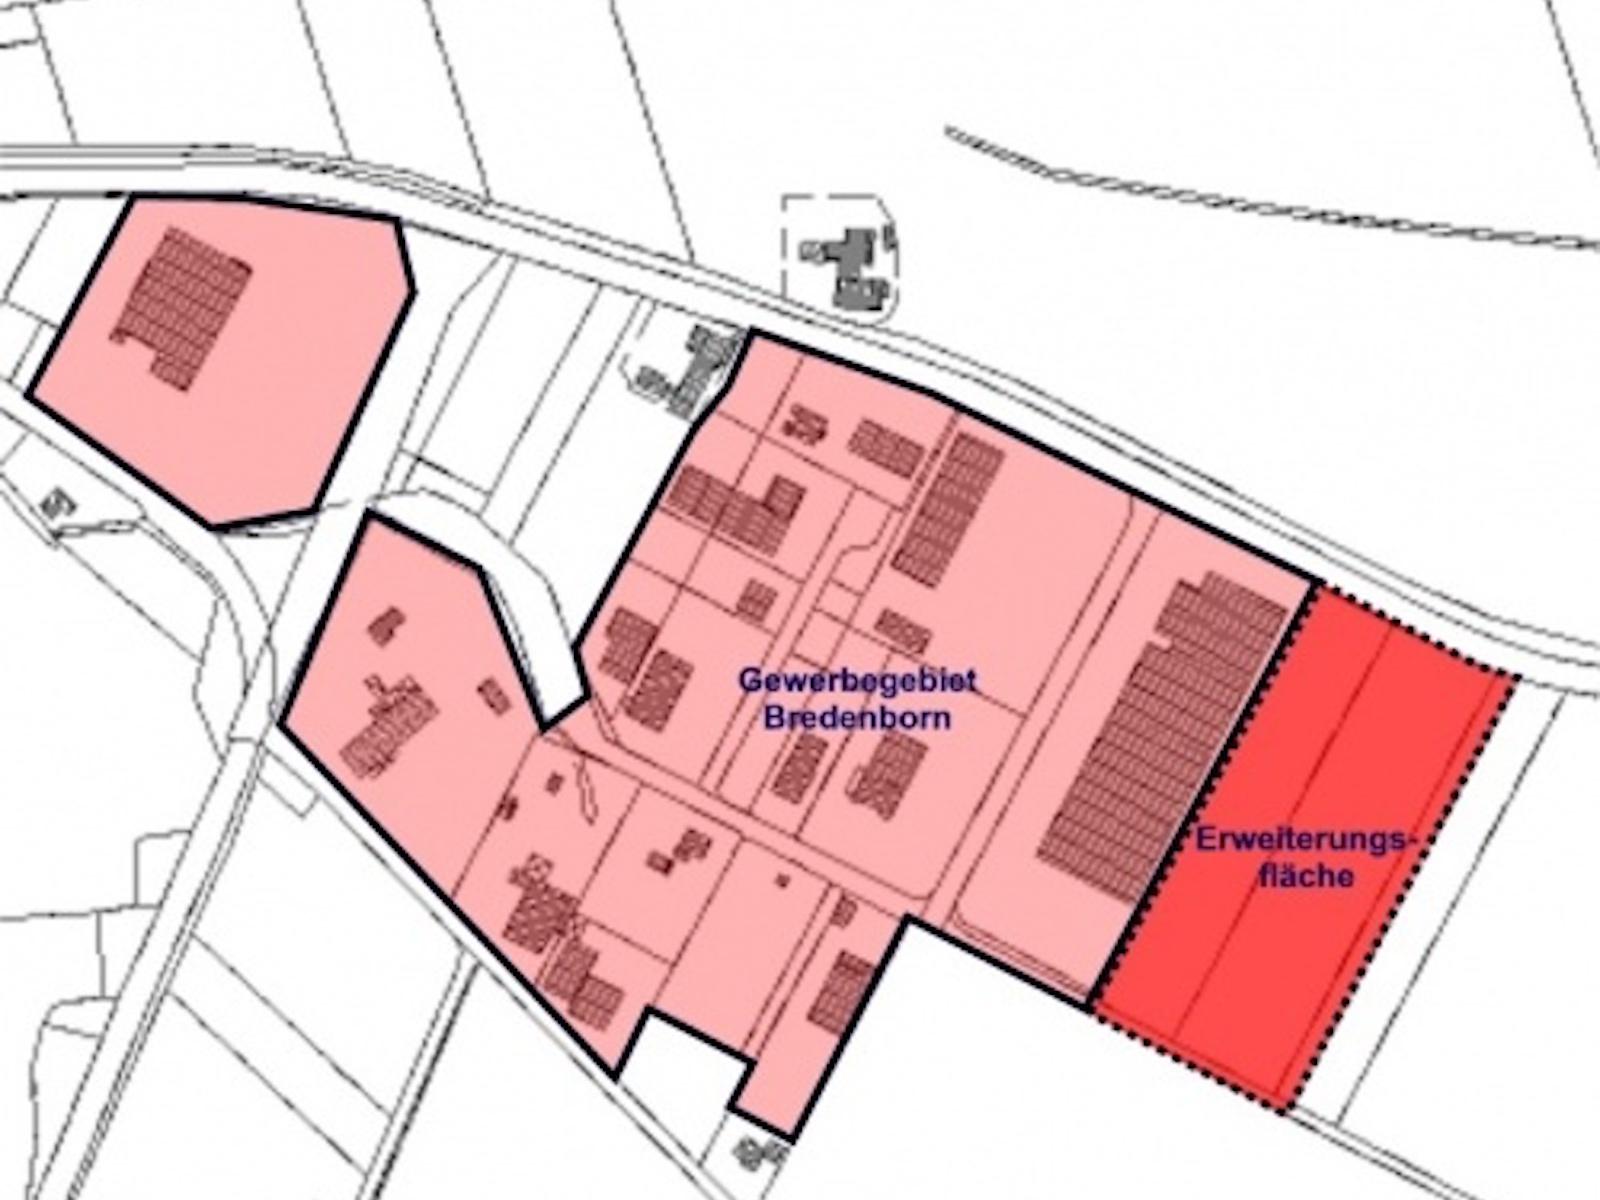 Plan Gewerbegebiet Bredenborn